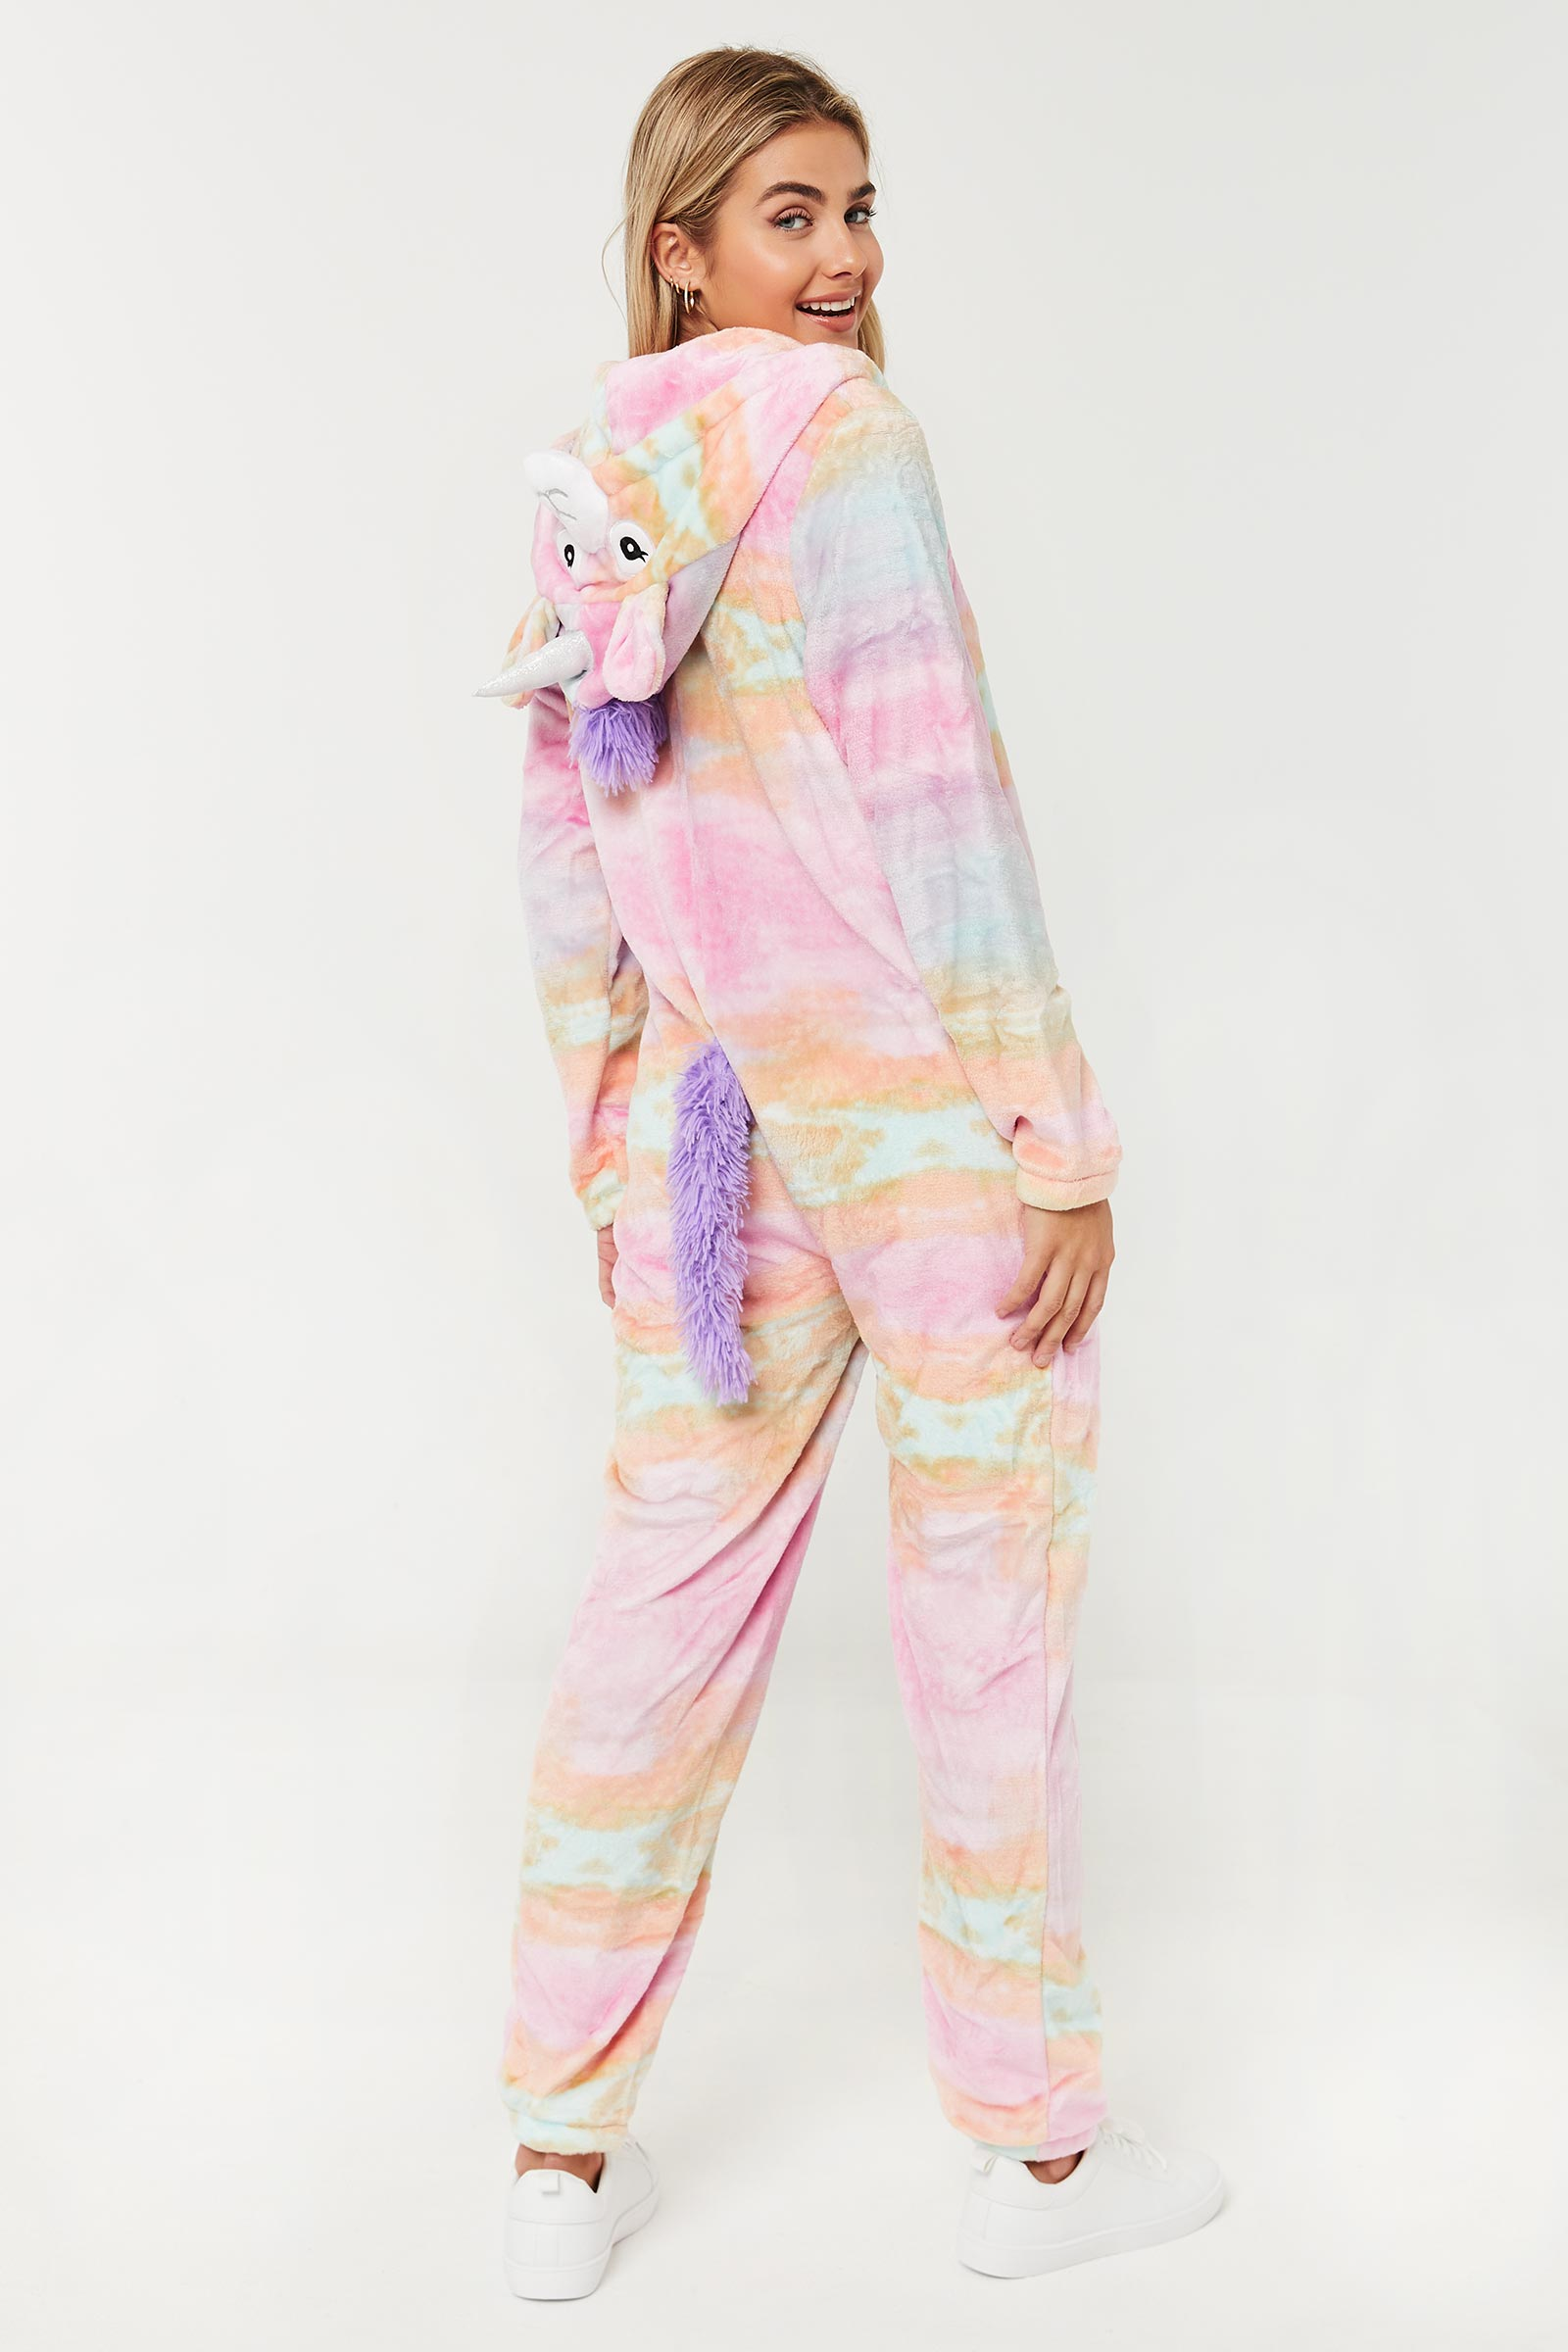 Costume une-pièce de licorne